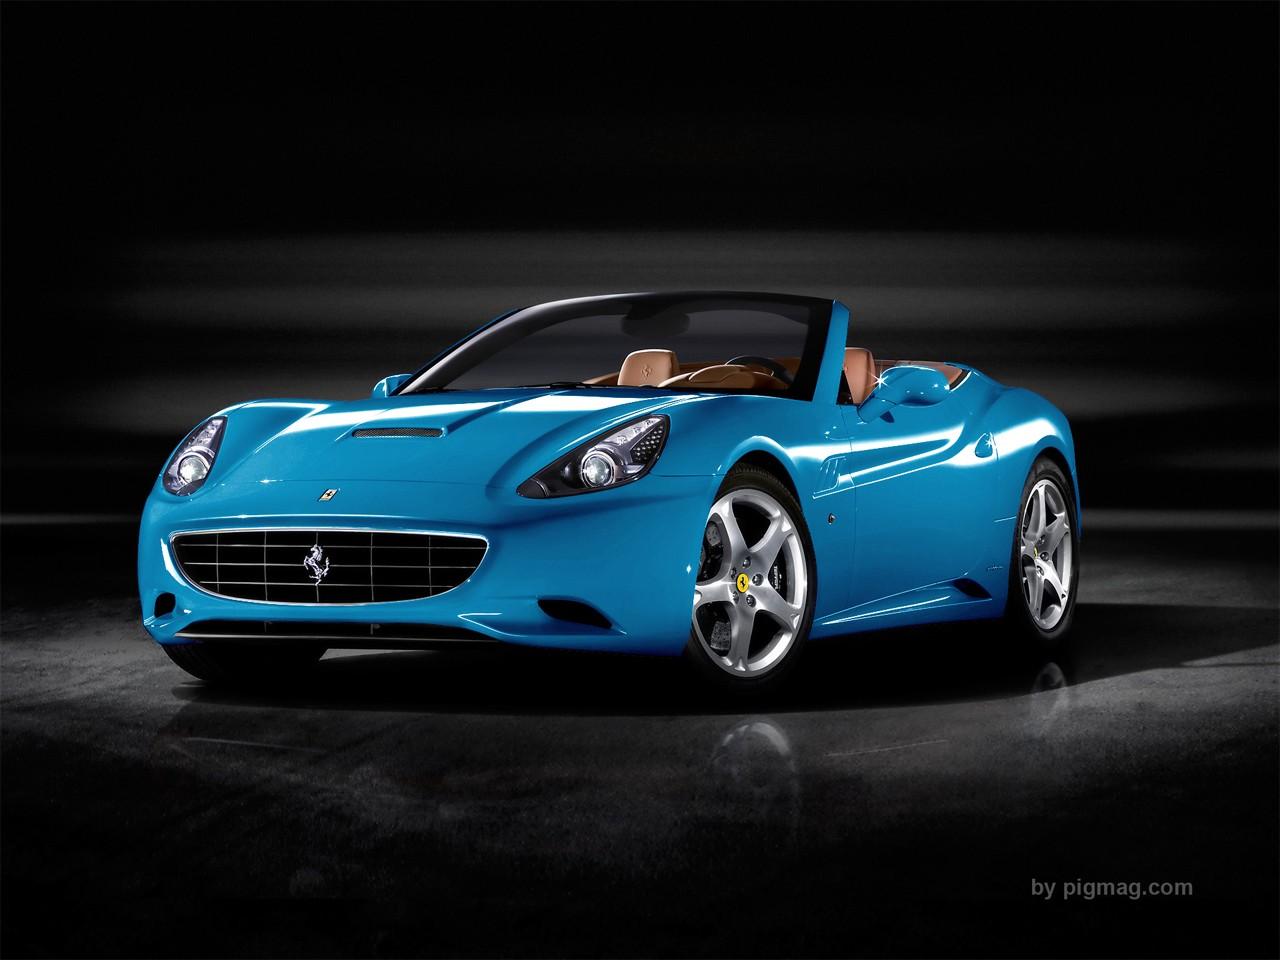 Ferrari California Light Sky Blue World Cars Wallpaper For Ios